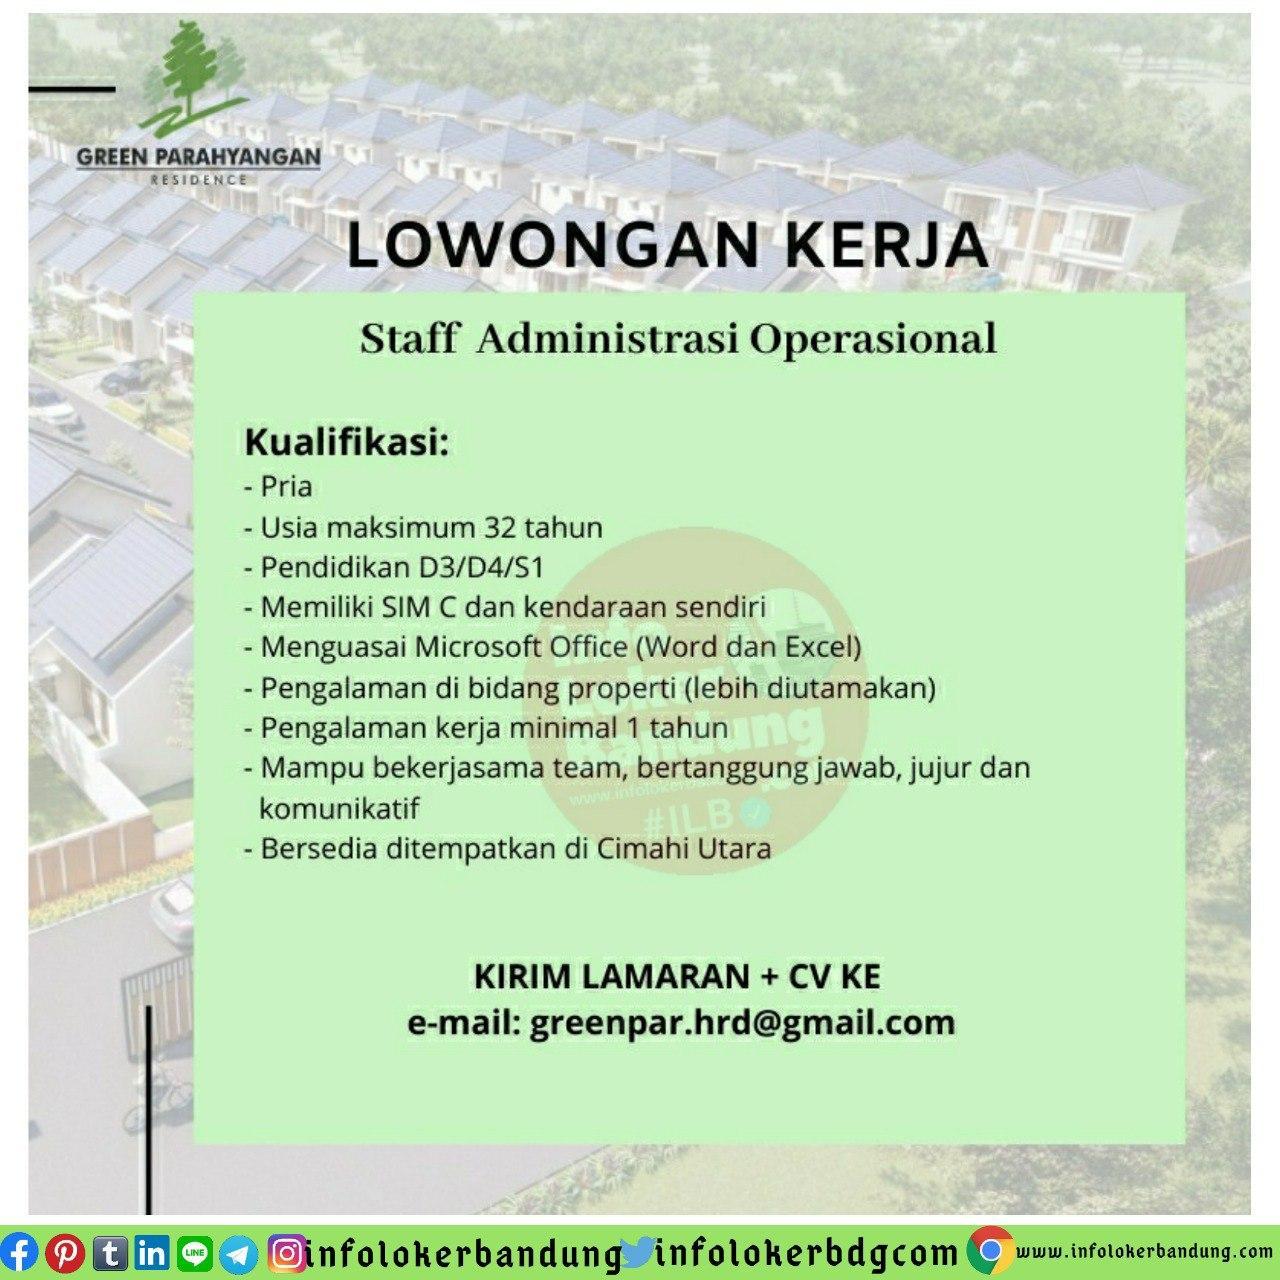 Lowongan Kerja Staff Administrasi Operasional Green Parahyangan Residence Bandung Juni 2020